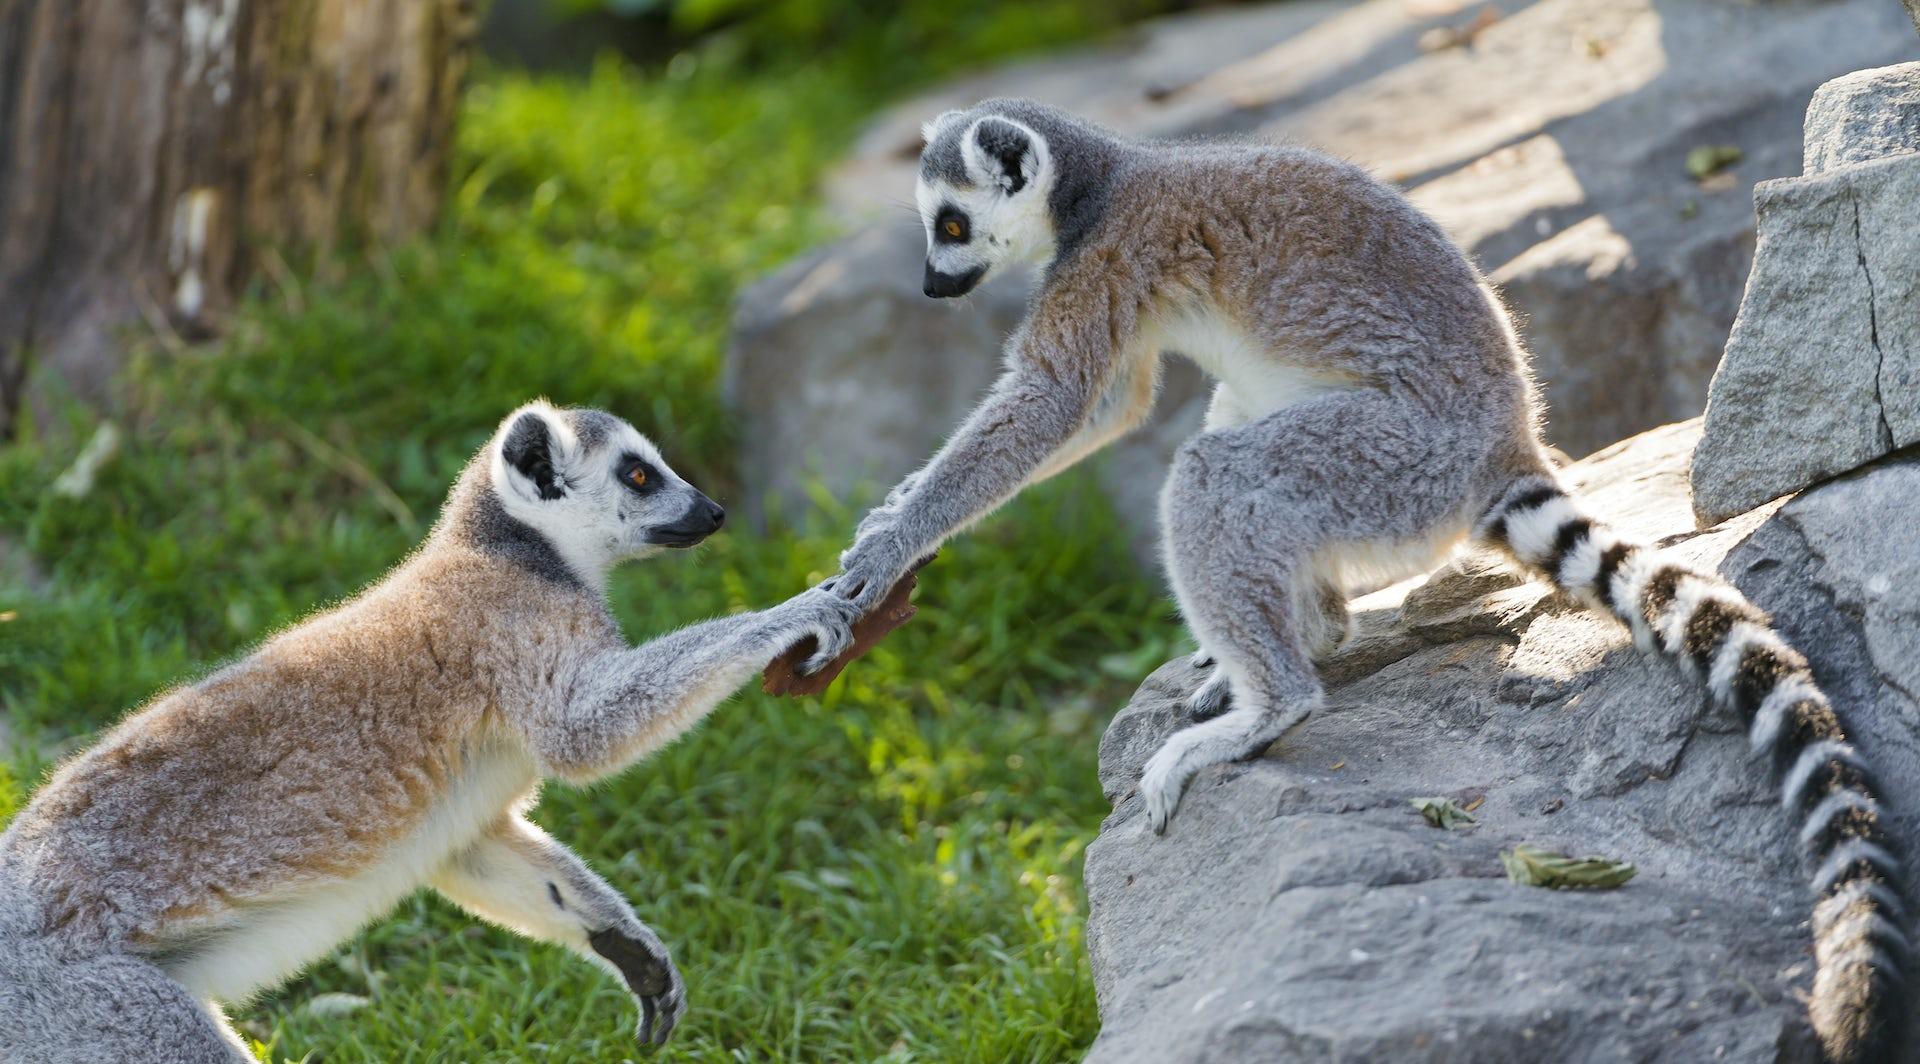 Mammal behavior traits of a sexual predator